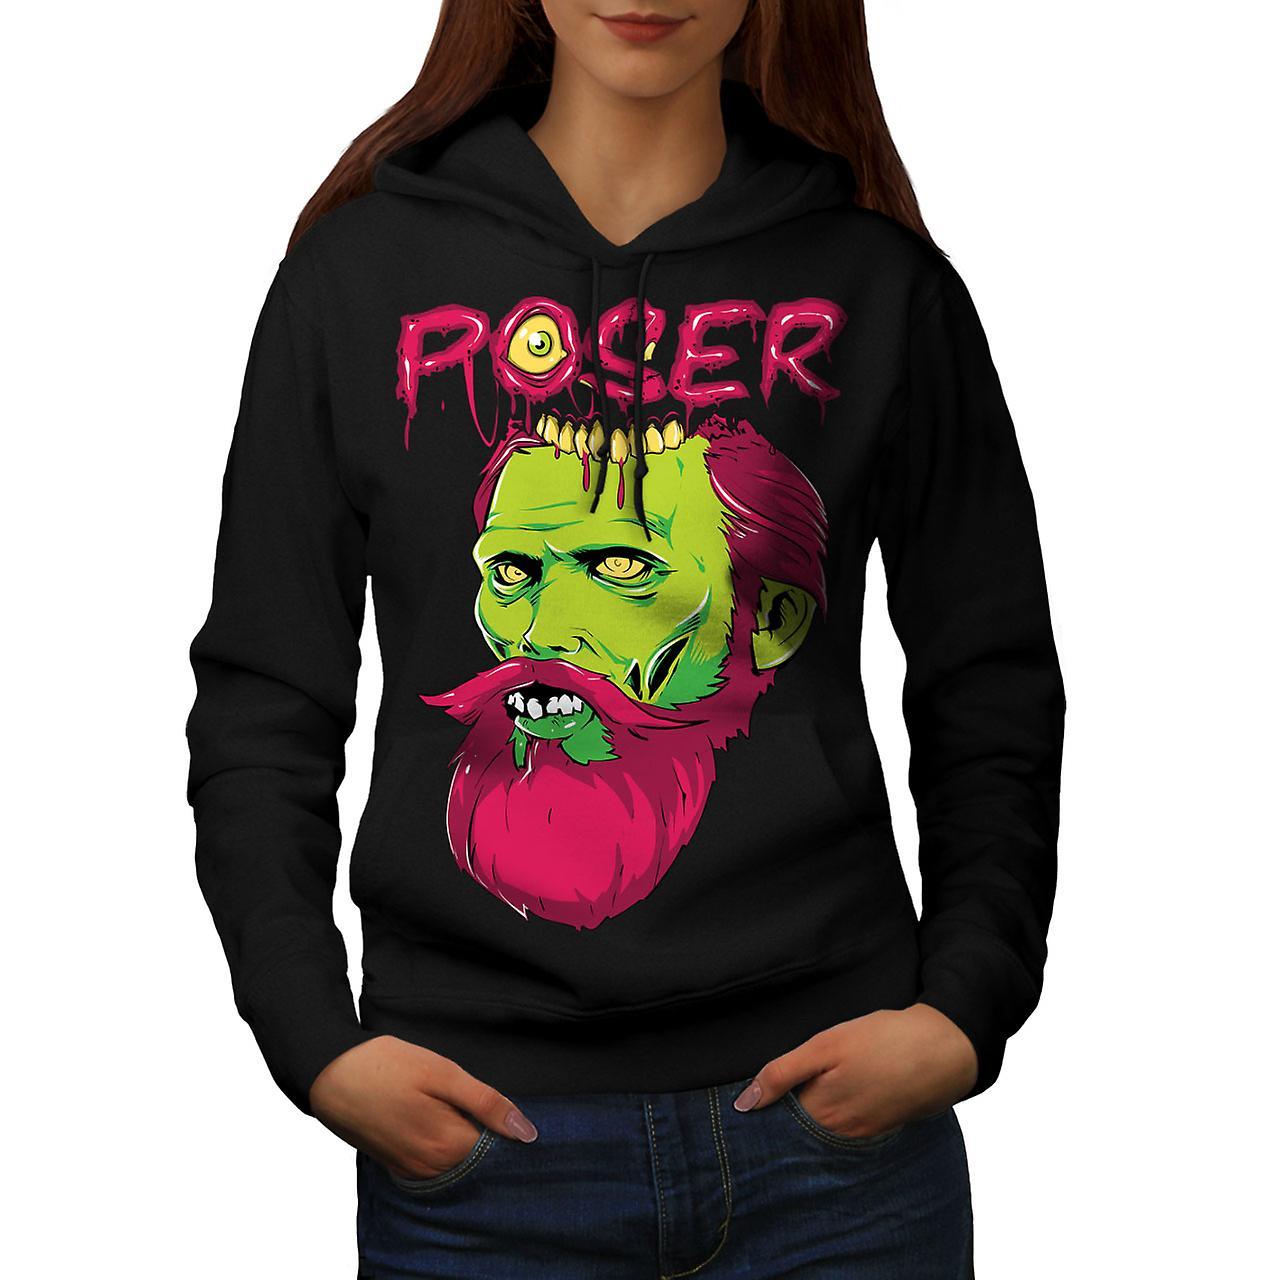 Poser Monster Rock Zombie Women Black Hoodie | Wellcoda